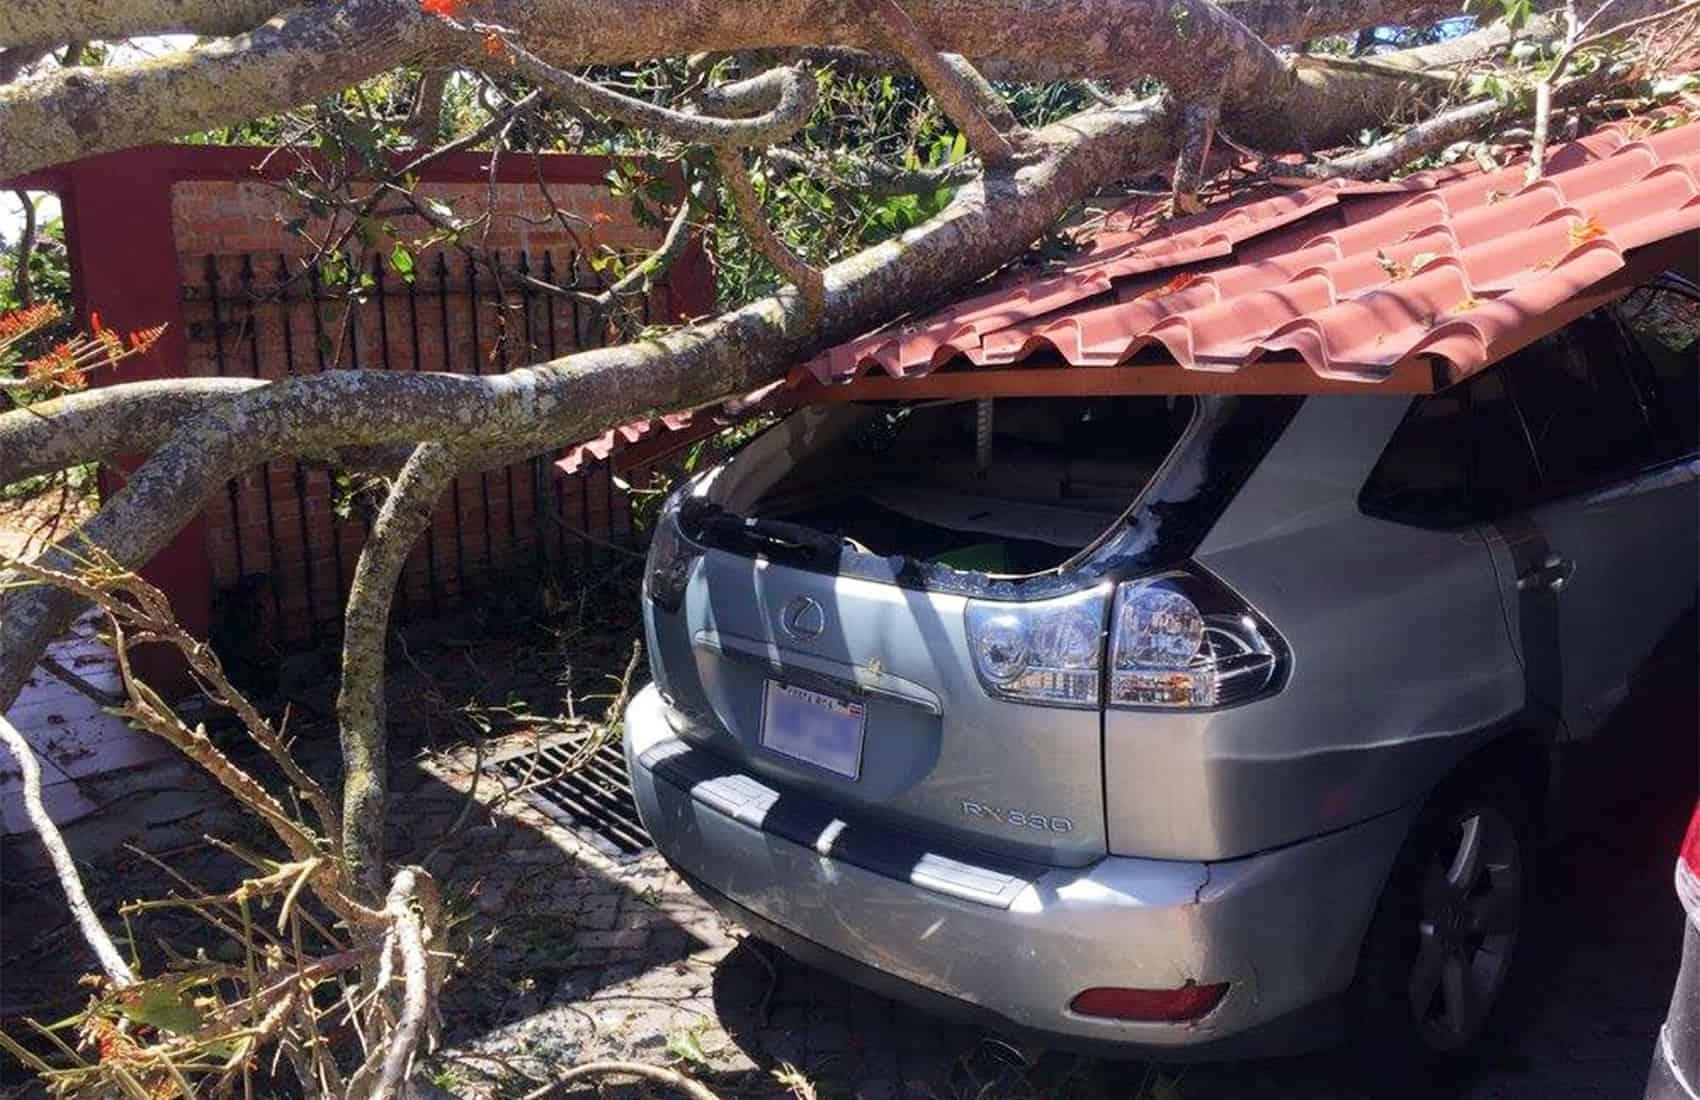 Costa Rica weather, Feb. 10, 2016.